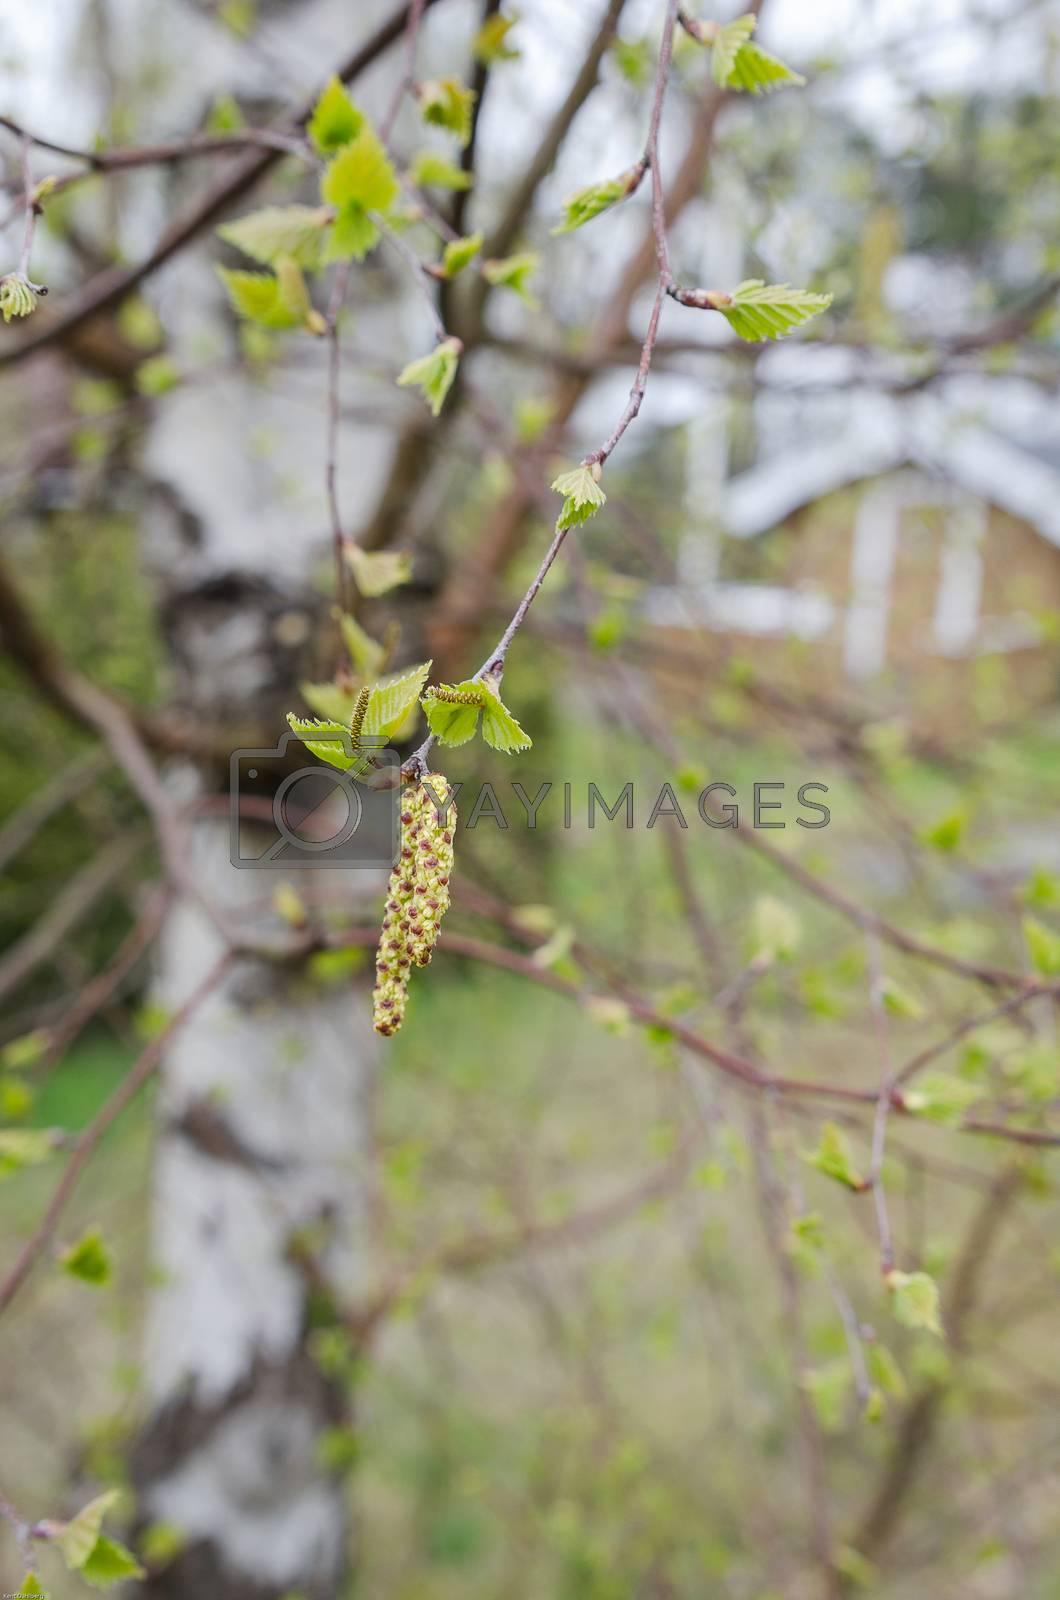 One birch full of pollen in spring bad for allergy